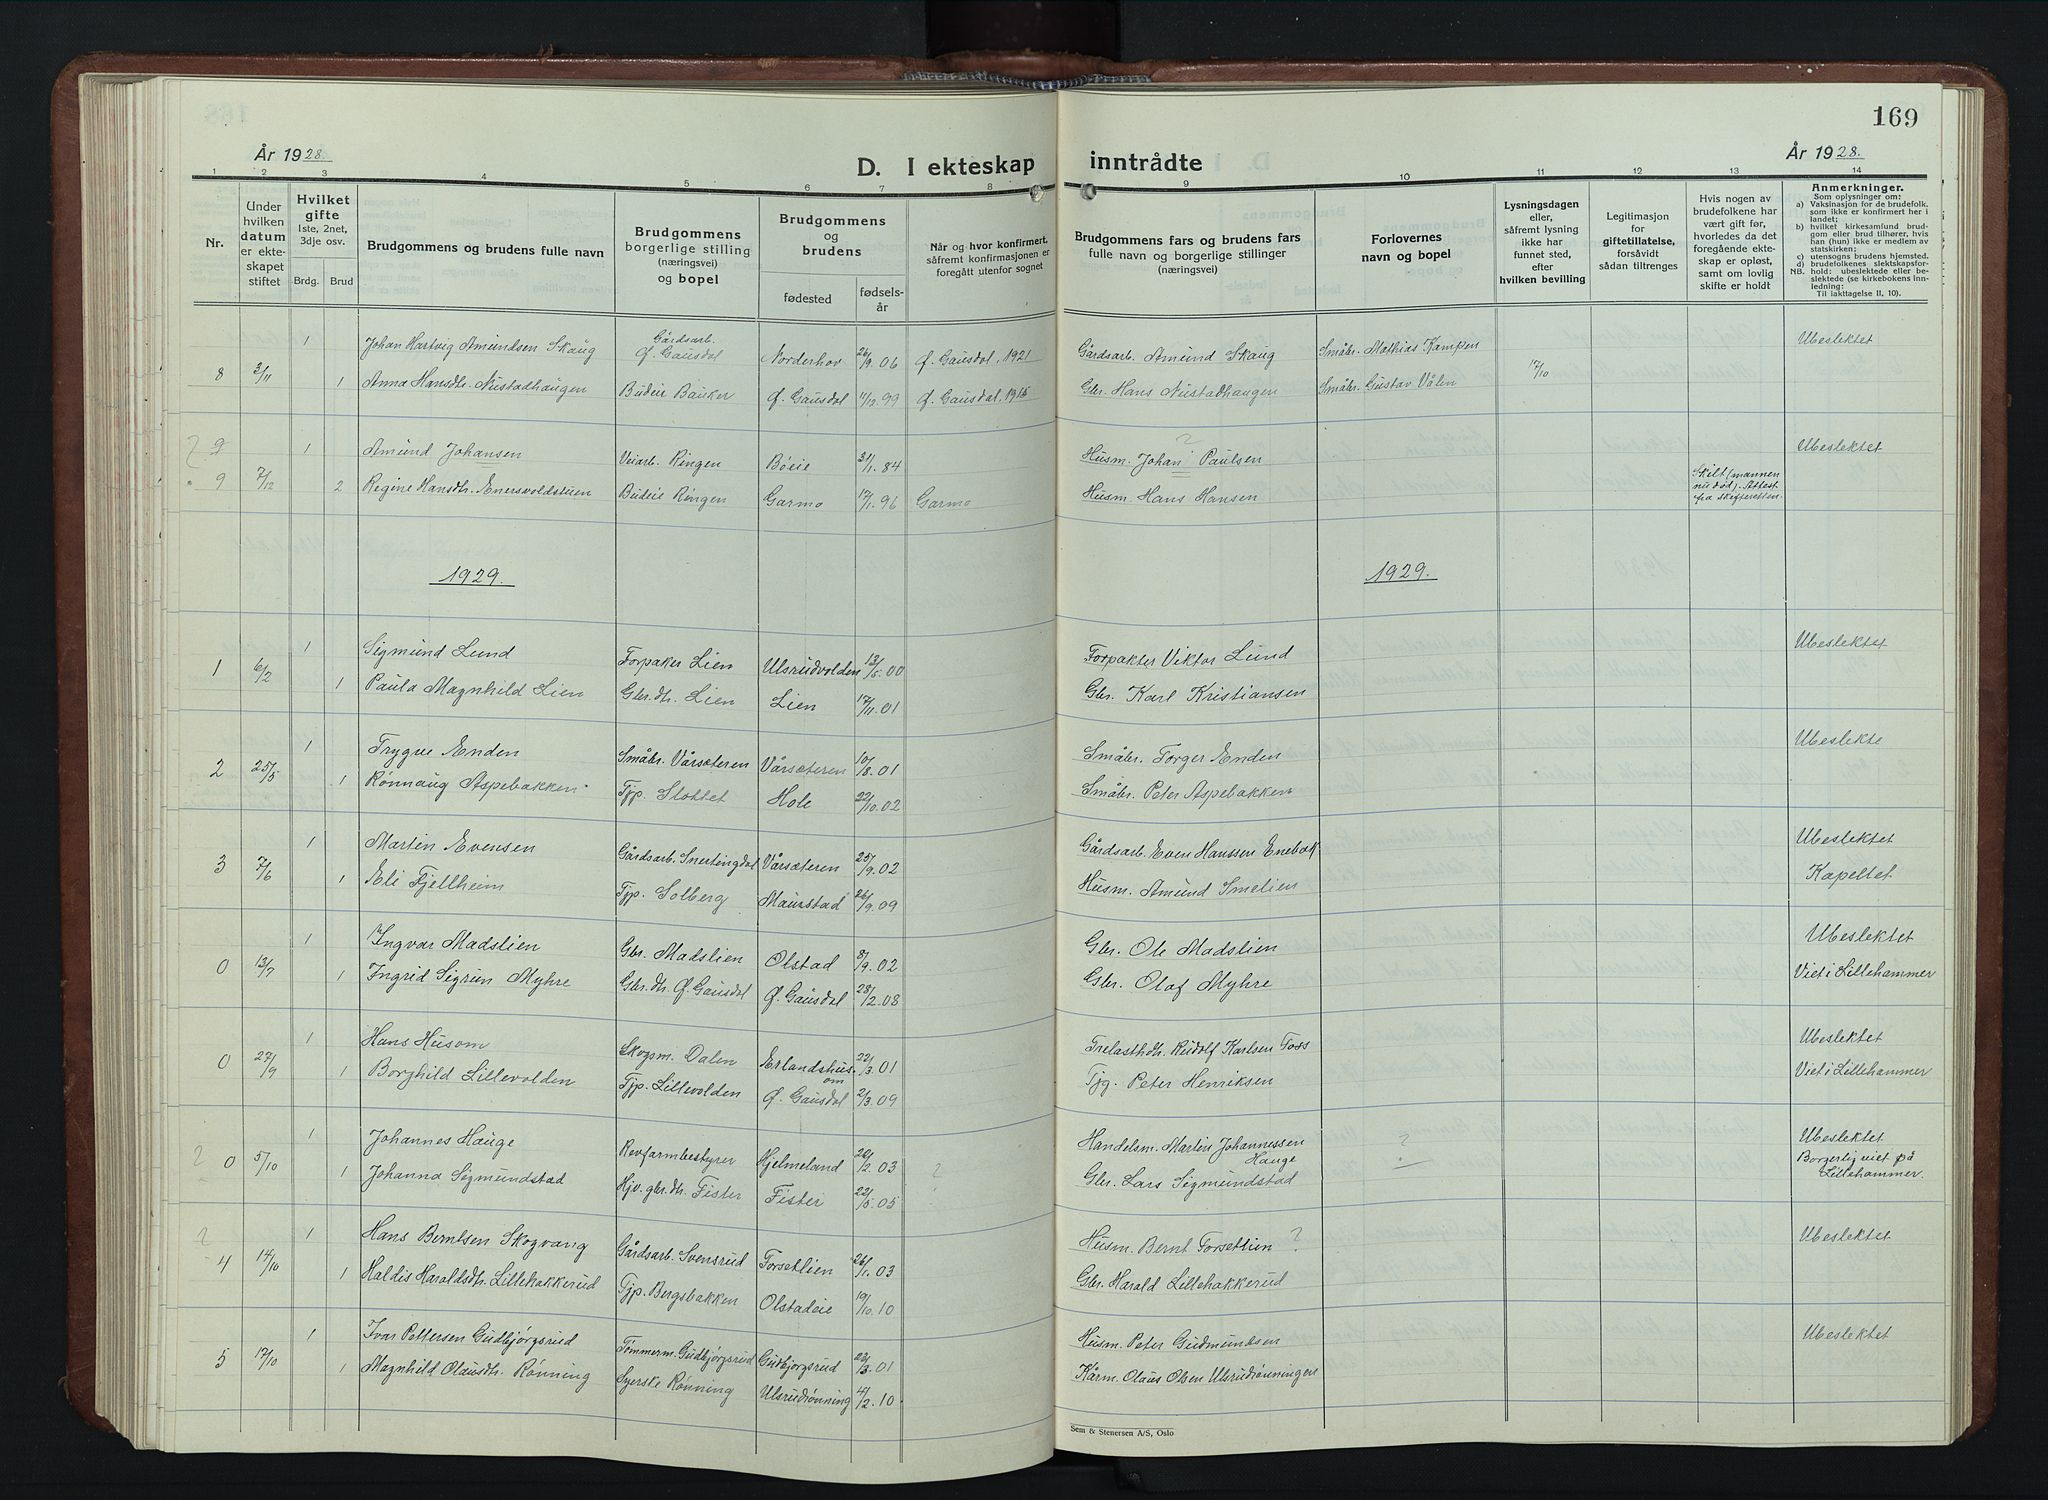 SAH, Vestre Gausdal prestekontor, Klokkerbok nr. 5, 1926-1955, s. 169